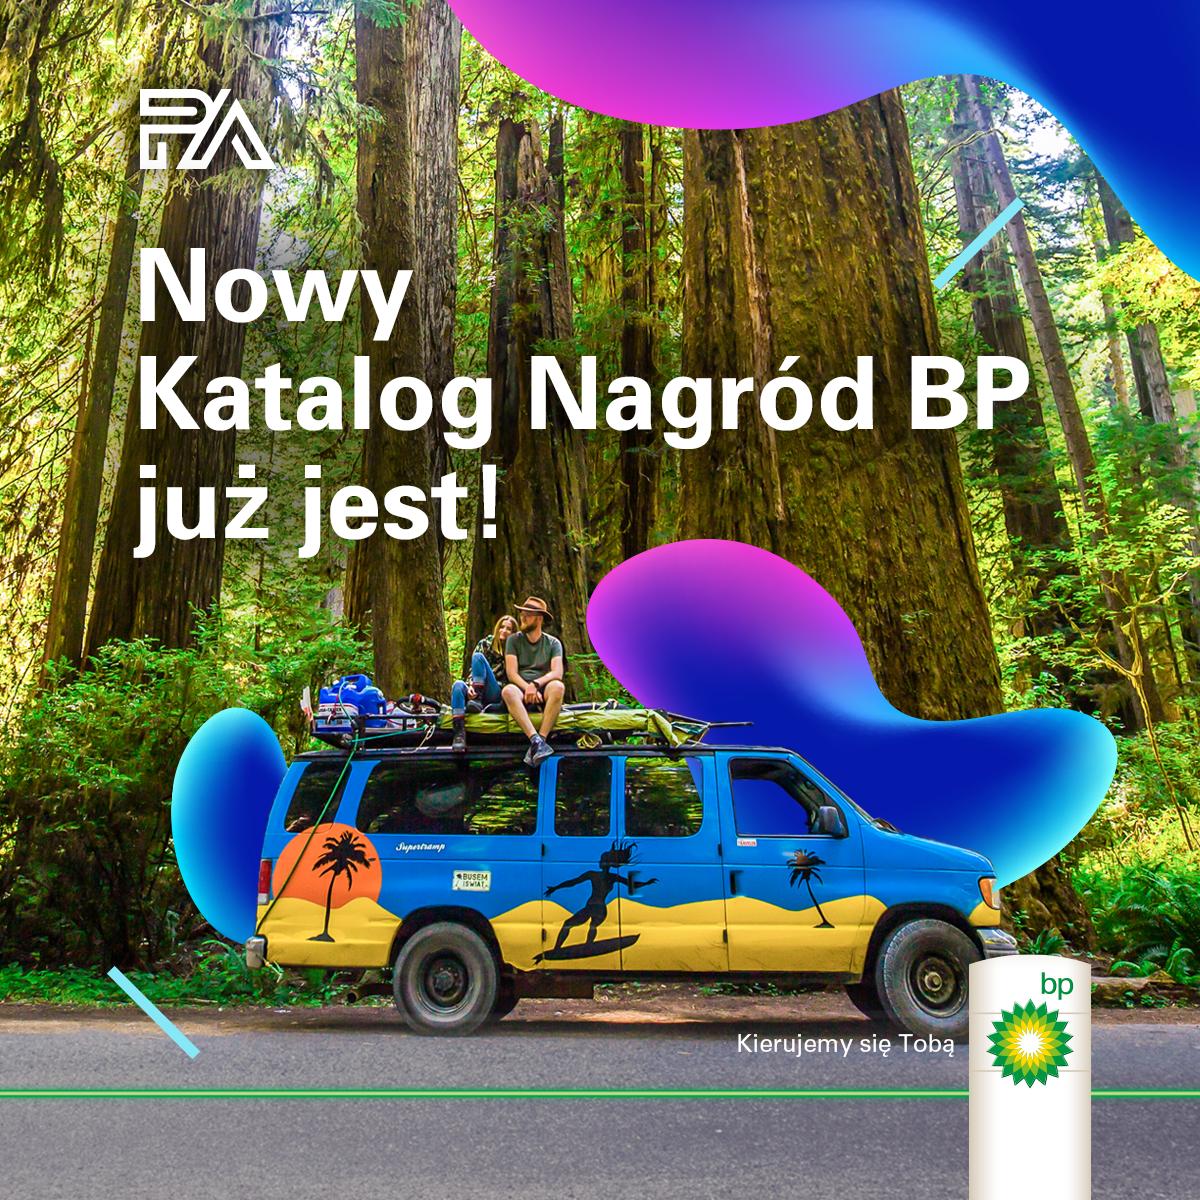 PA agencja bp polska katalog nagrod 2019 2020